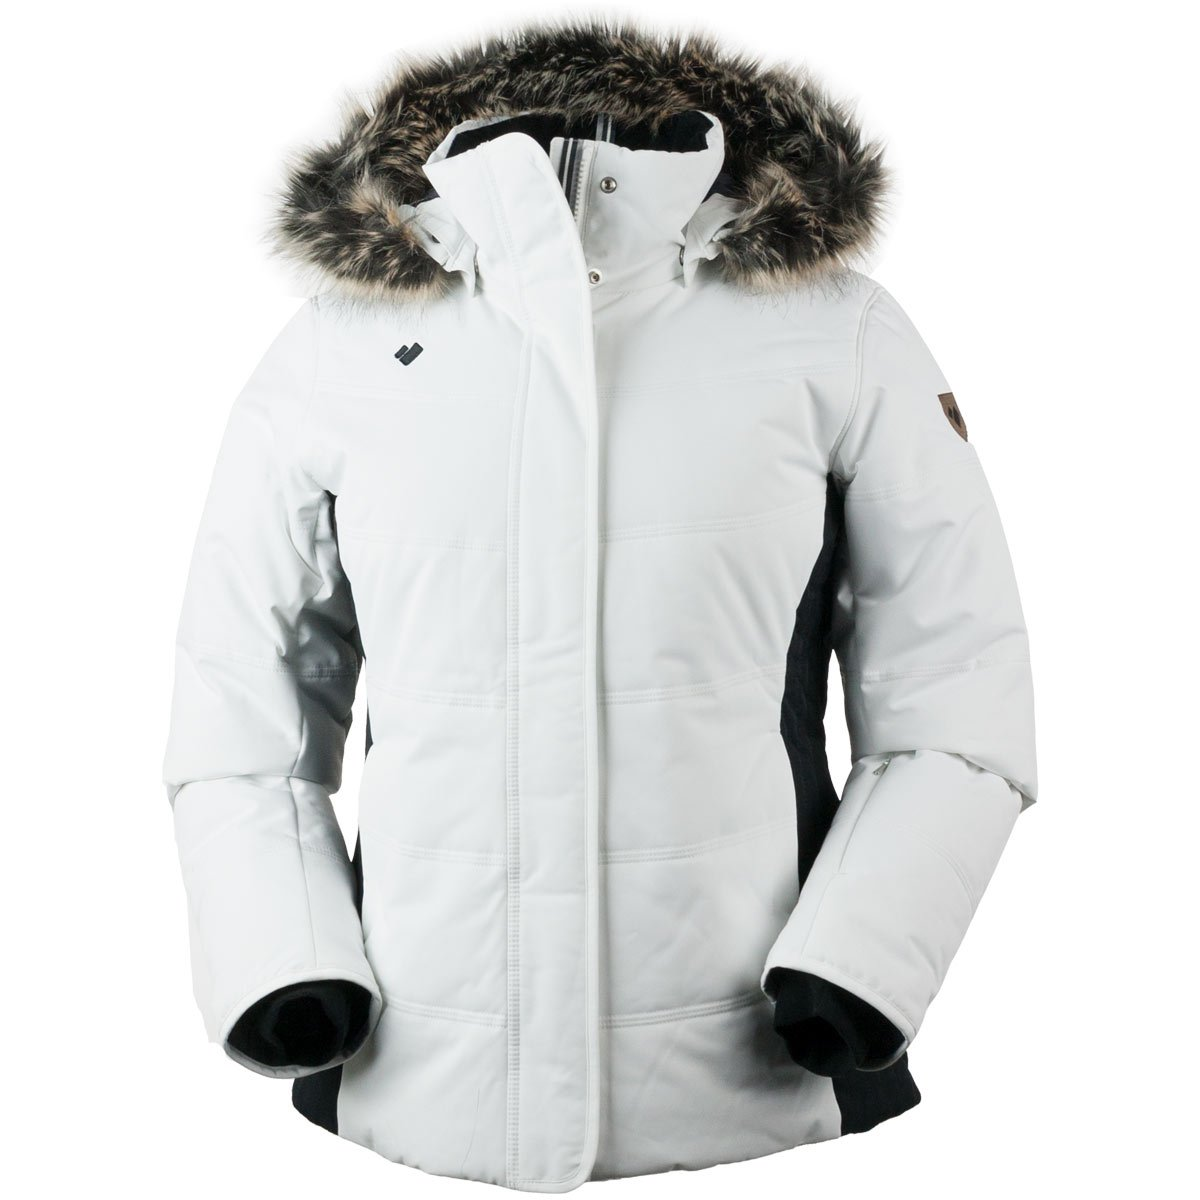 Obermeyer Women's Tuscany Jacket White 8P by Obermeyer